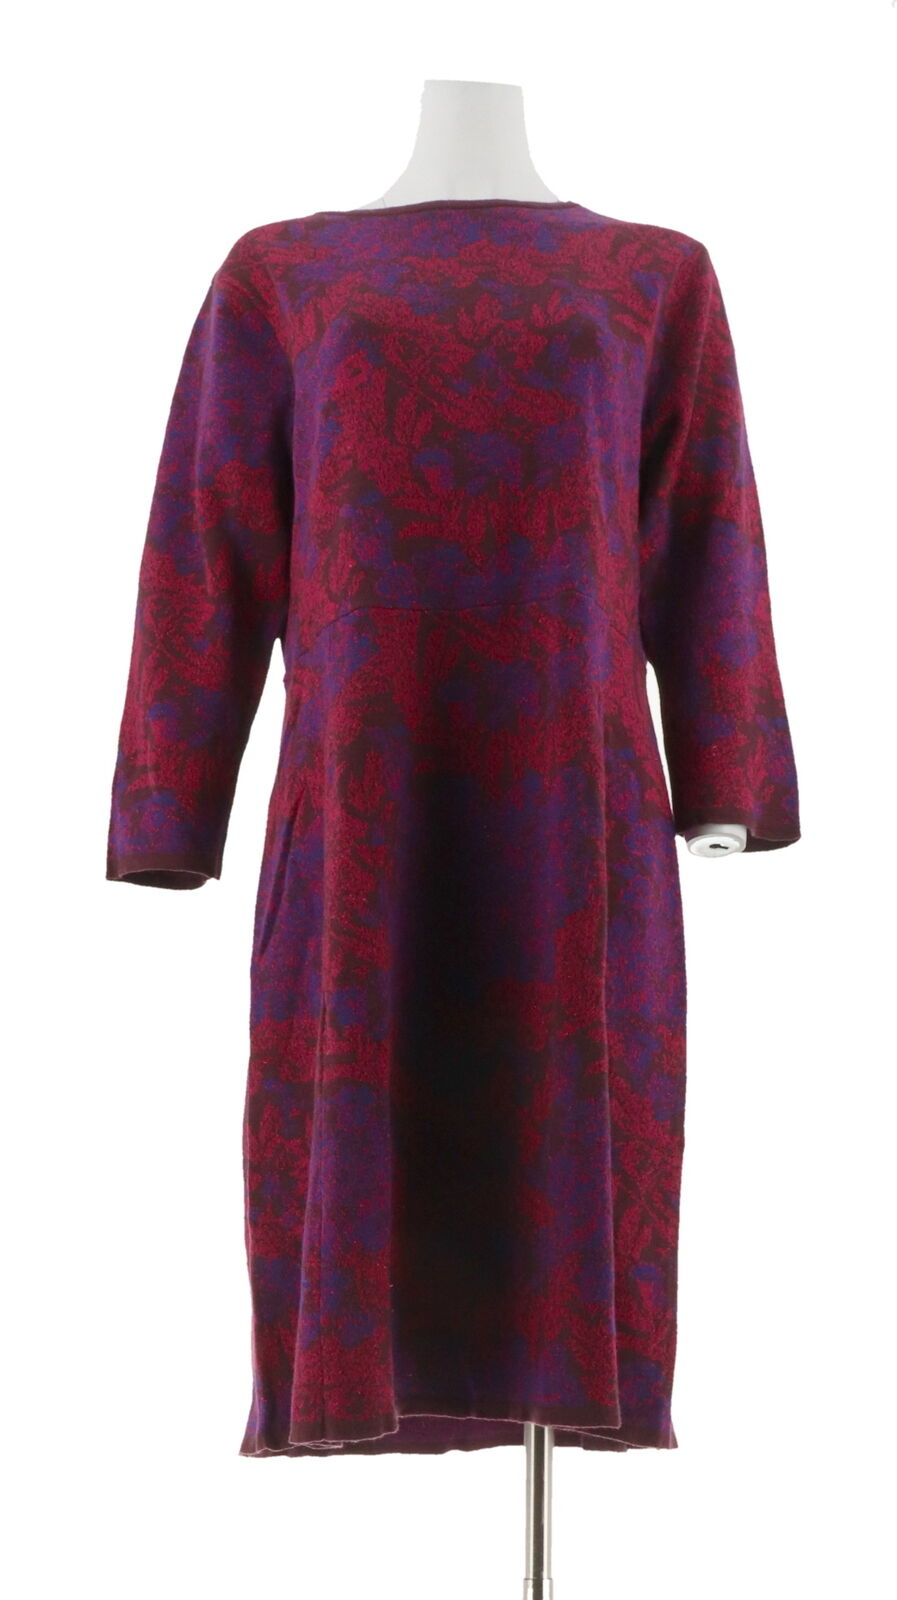 Isaac Mizrahi Floral Lurex Jacquard Sweater Dress Deep Burgundy L NEW A270549